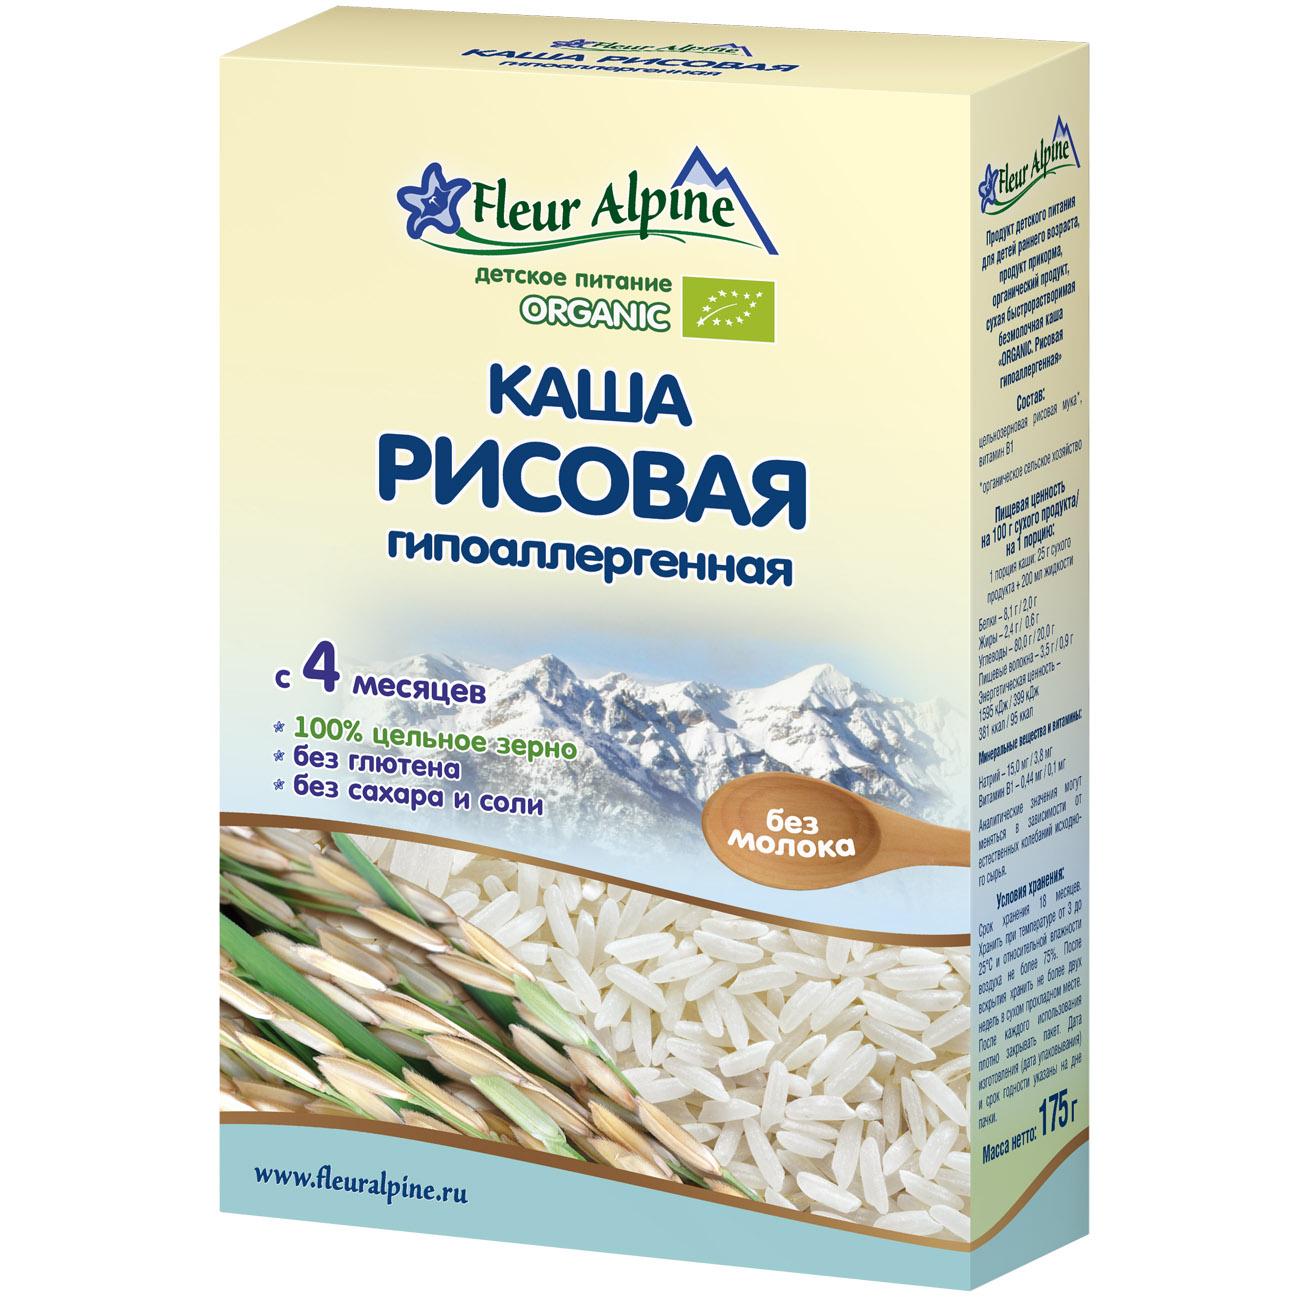 Каша Fleur Alpine Органик безмолочная 175 гр Рисовая (с 4 мес)<br>